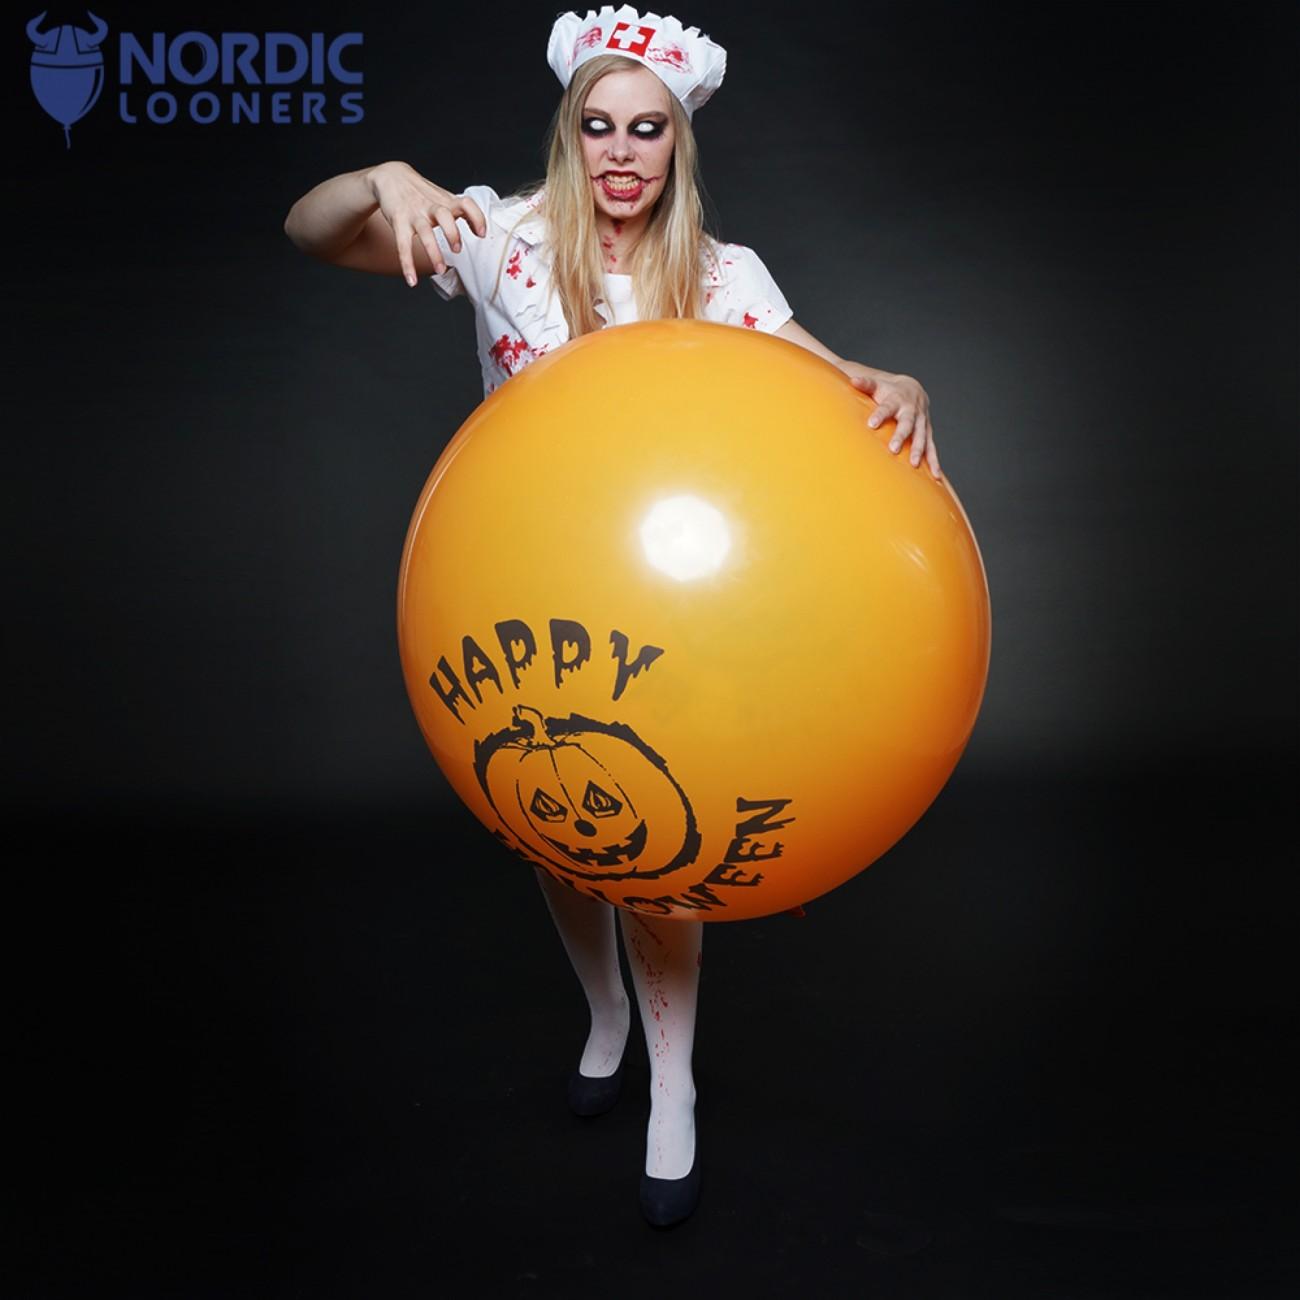 "Cattex 35\\"" Halloween PT/200DS.M1812 18,23 DKK Nordic Looners"